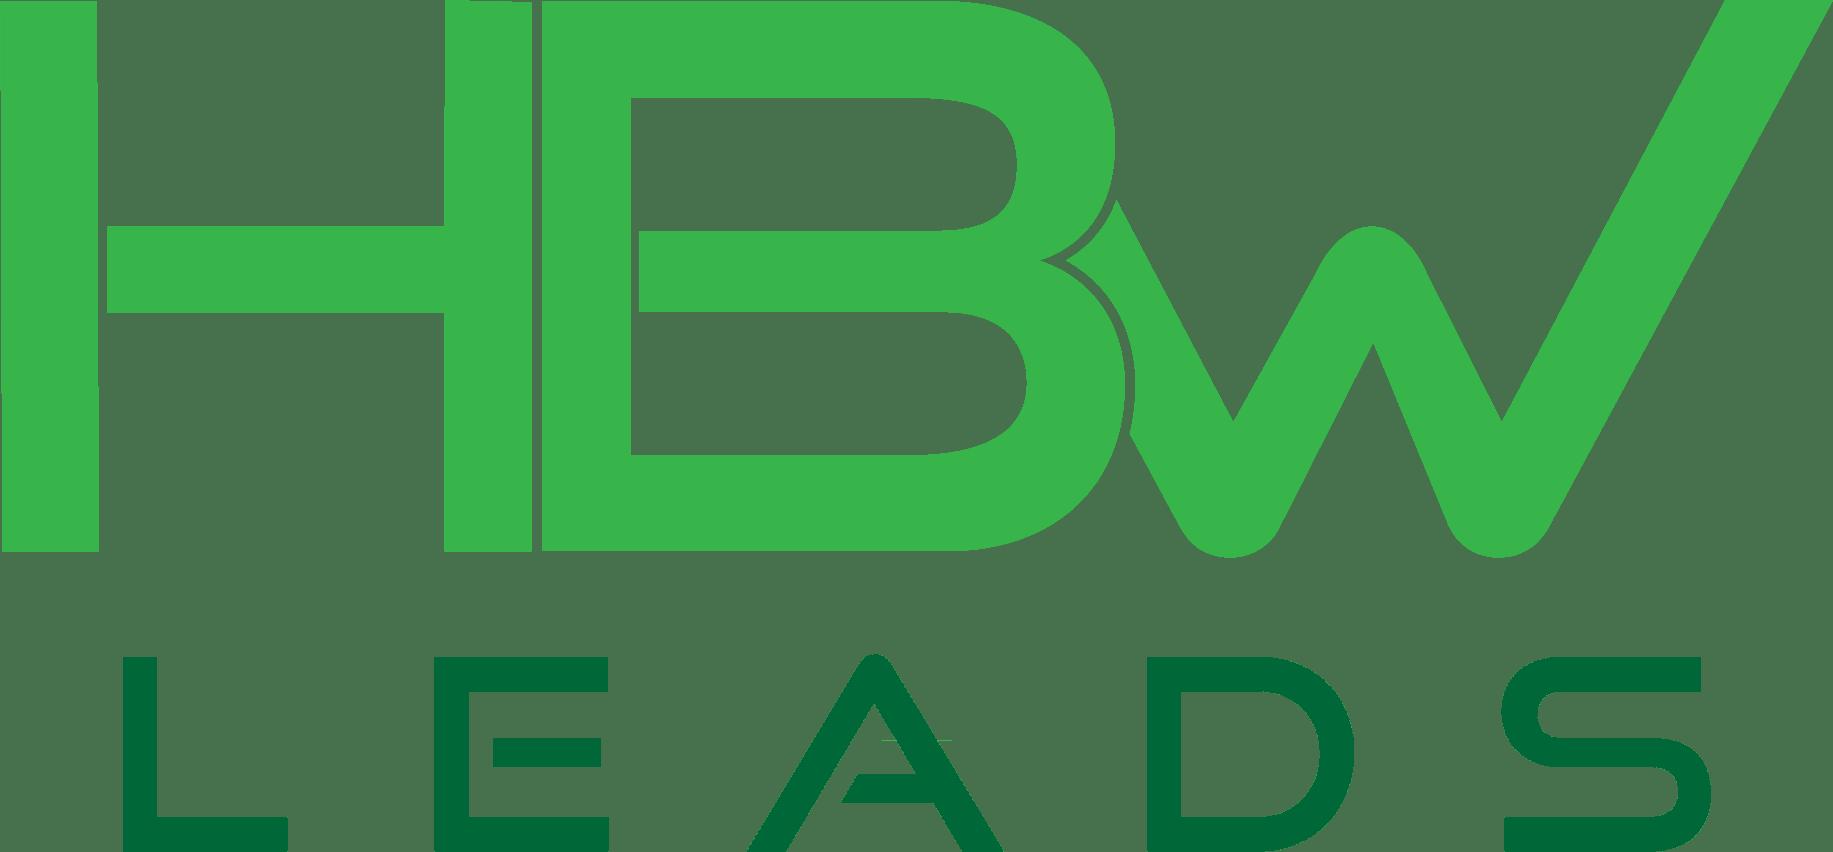 HBW Leads Logo